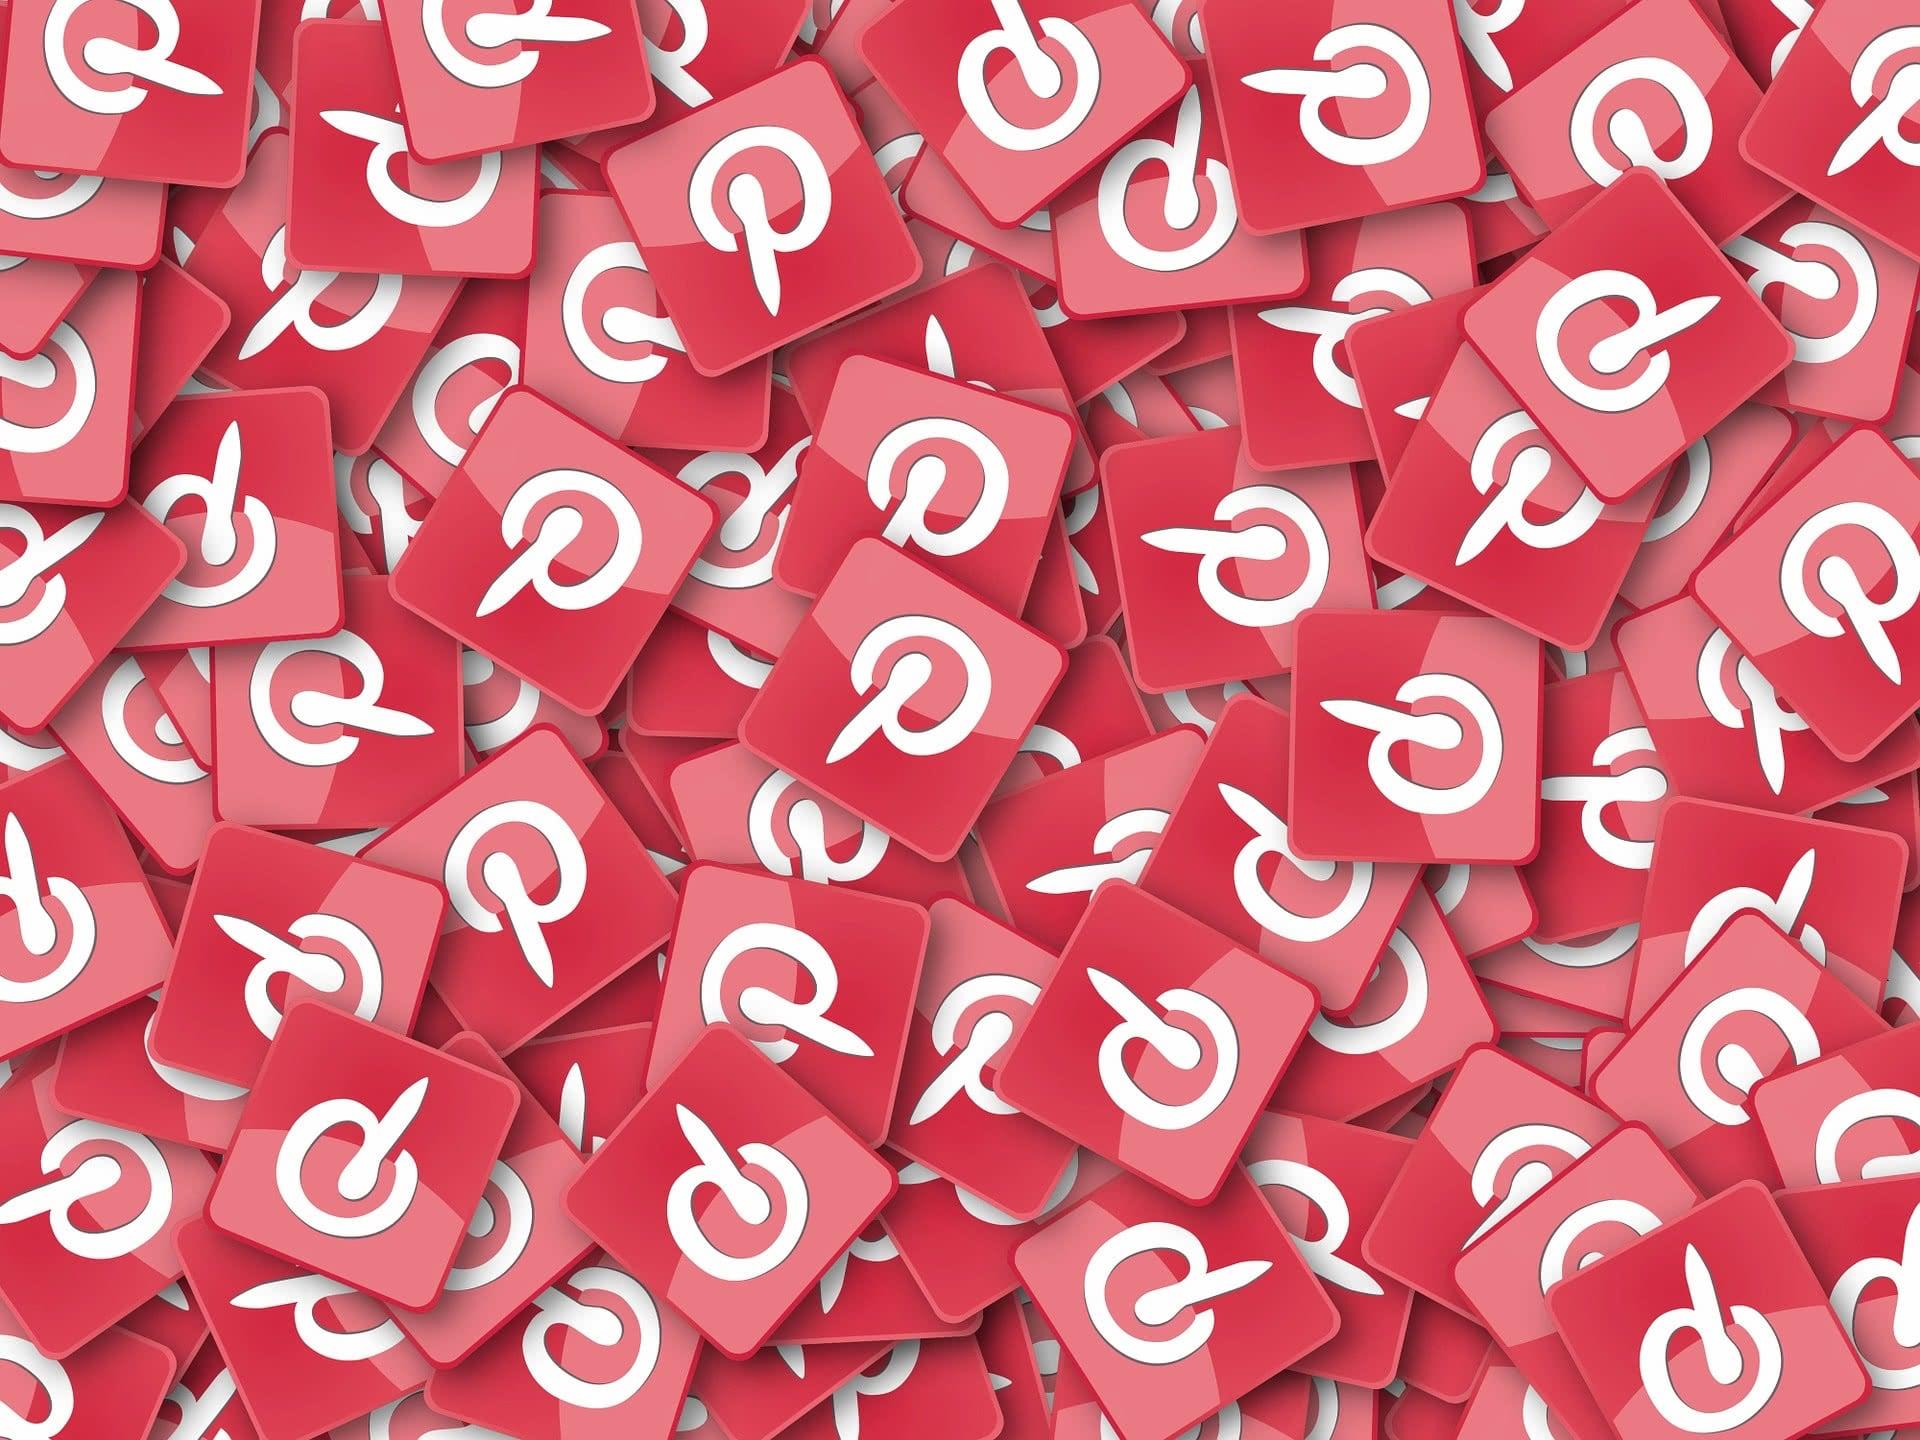 Pinterest App - Suche jetzt per Kamera